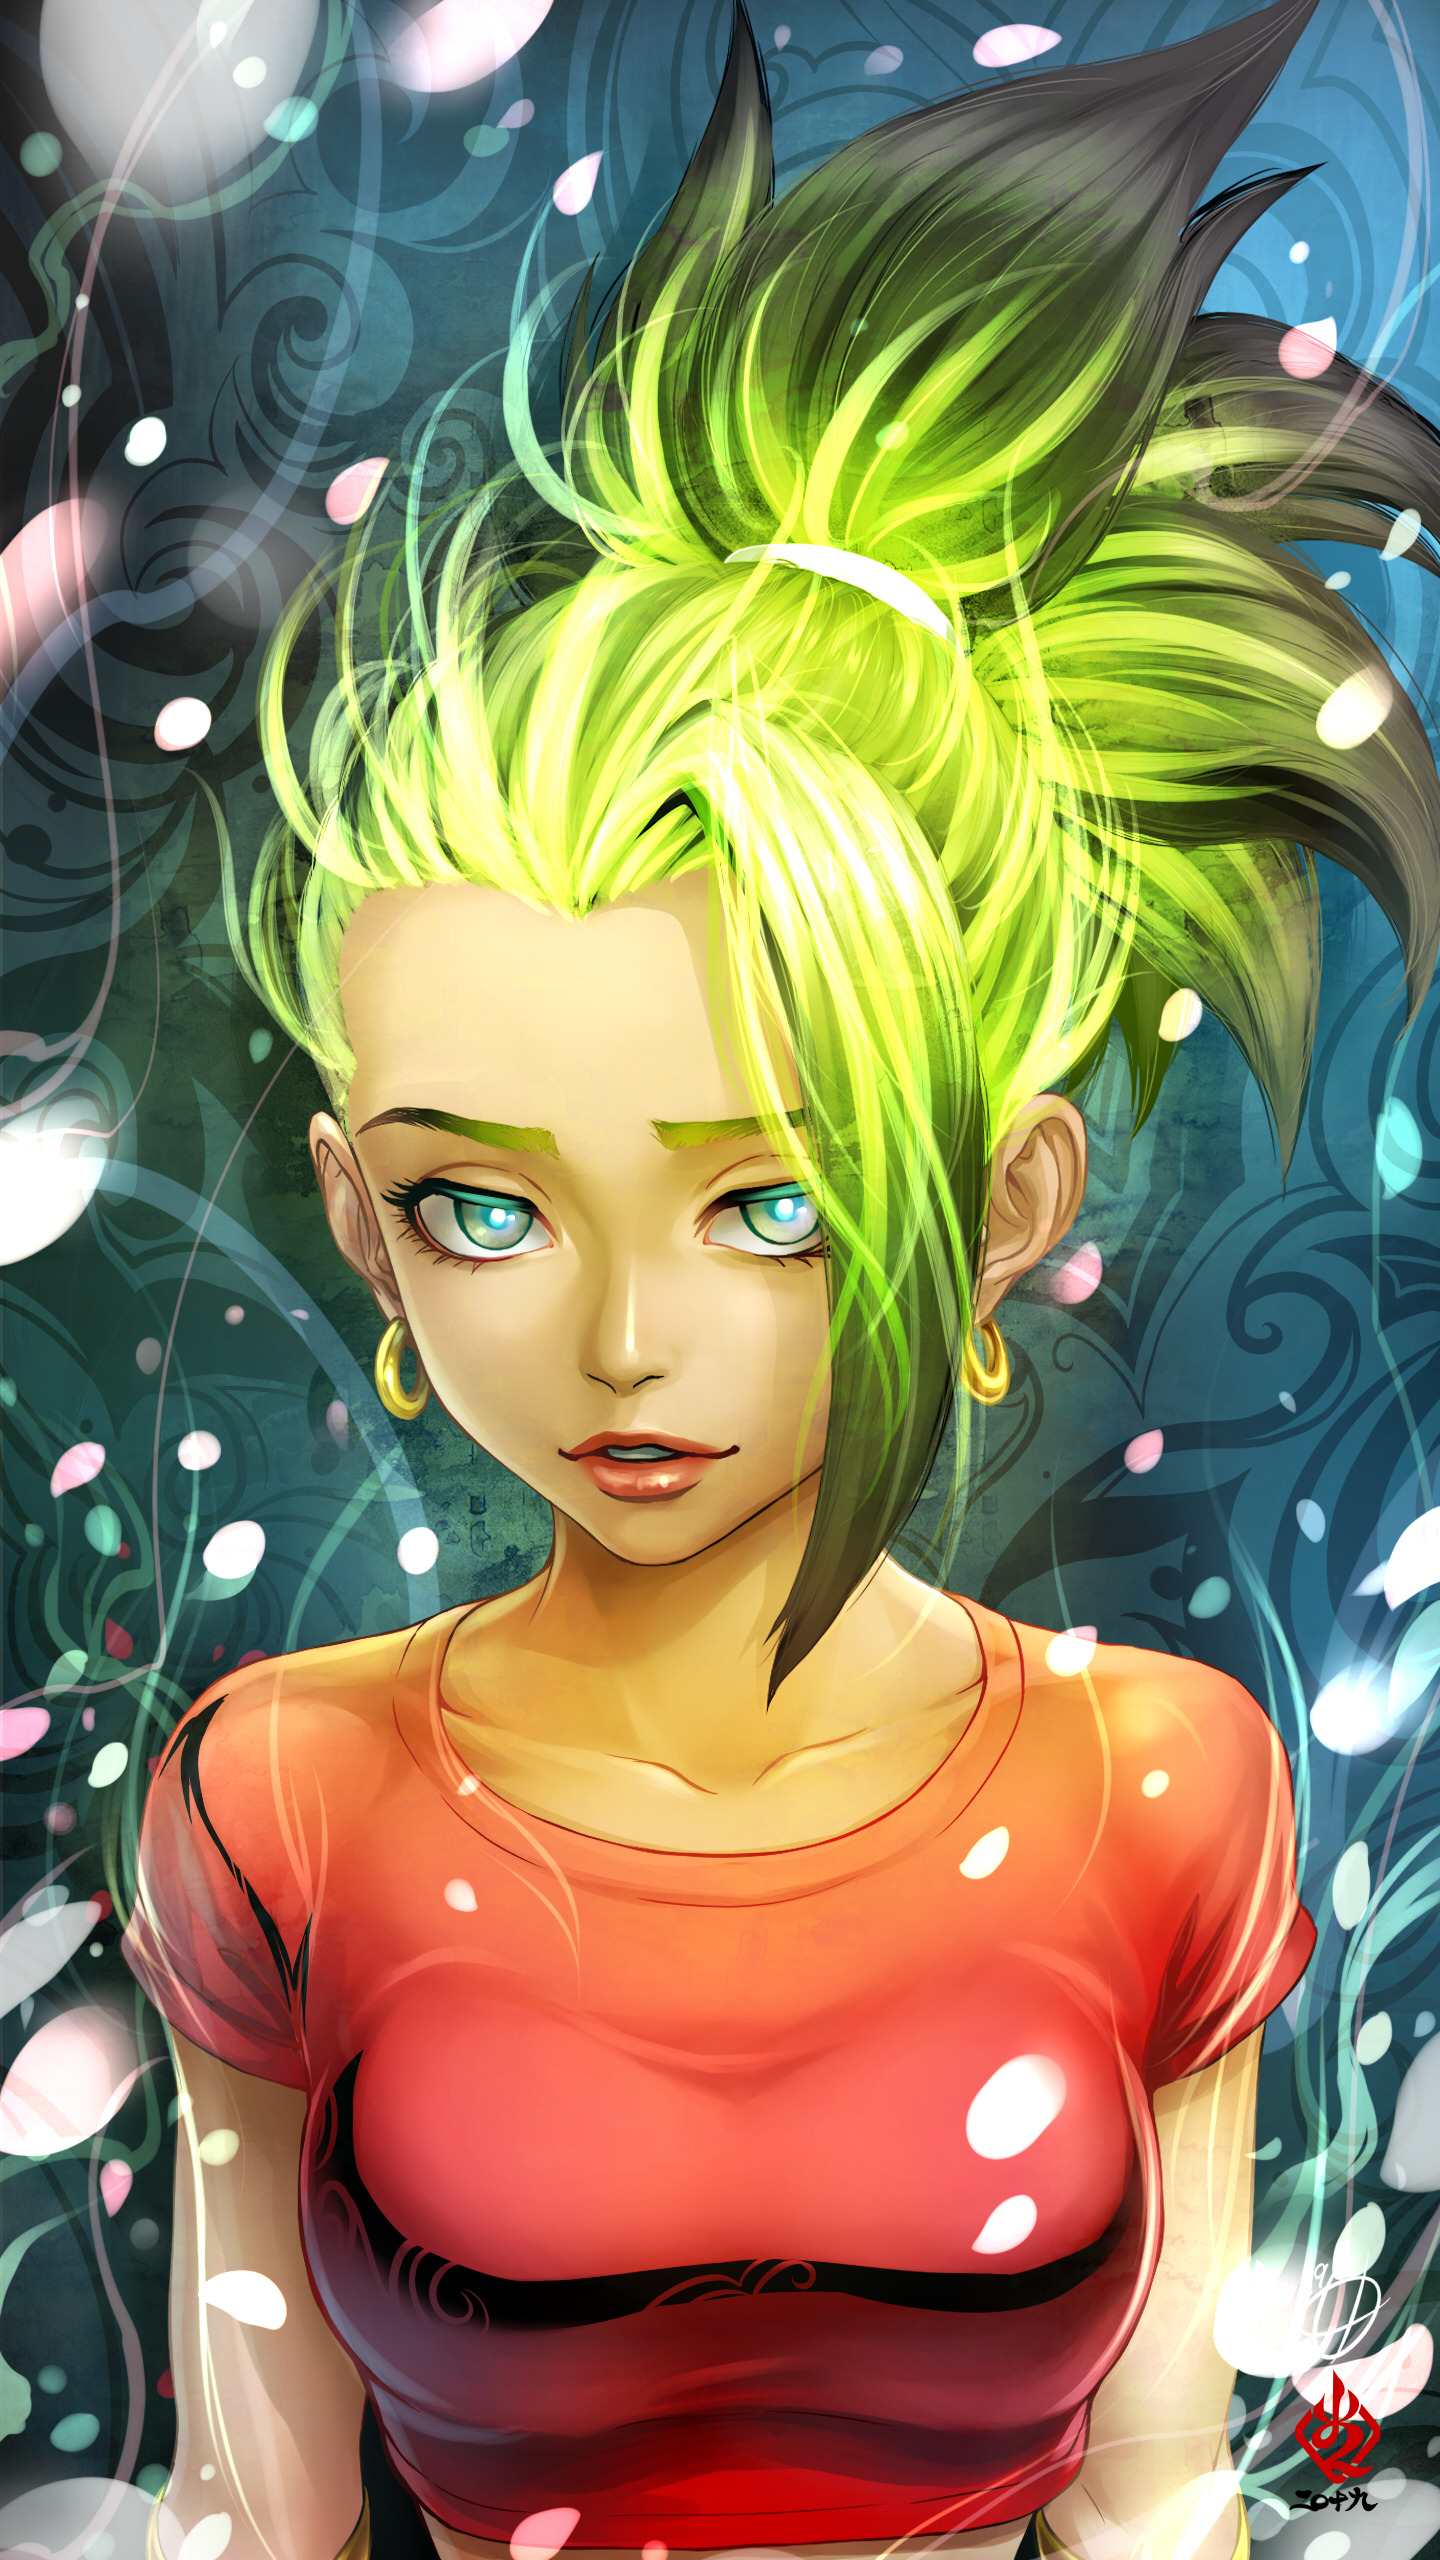 Kale Dragon Ball Super Image 2485870 Zerochan Anime Image Board